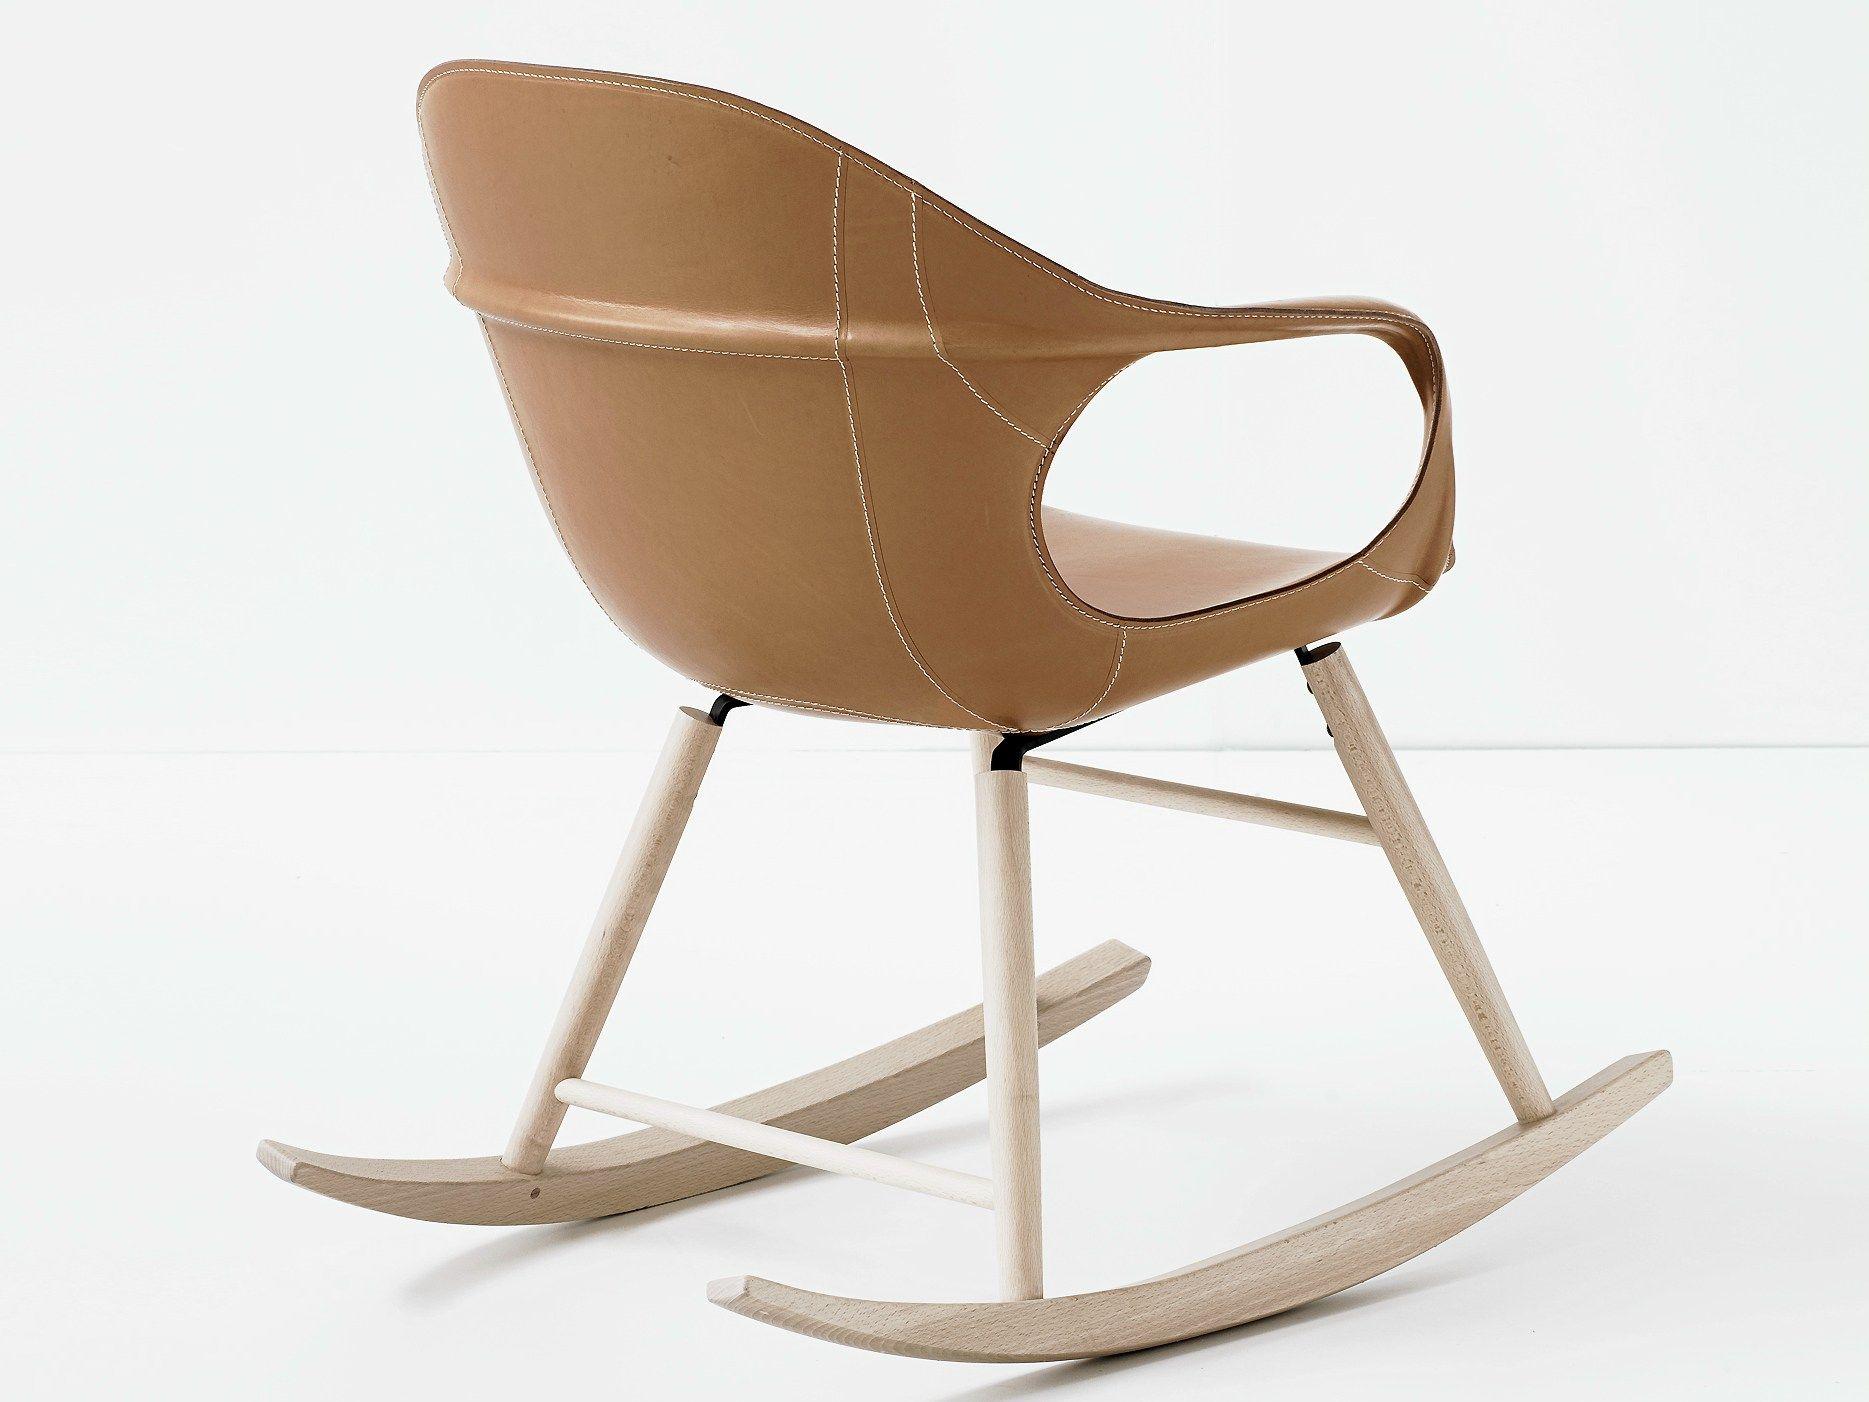 Kristalia Sedie ~ Rocking solid wood chair elephant rocking by kristalia design